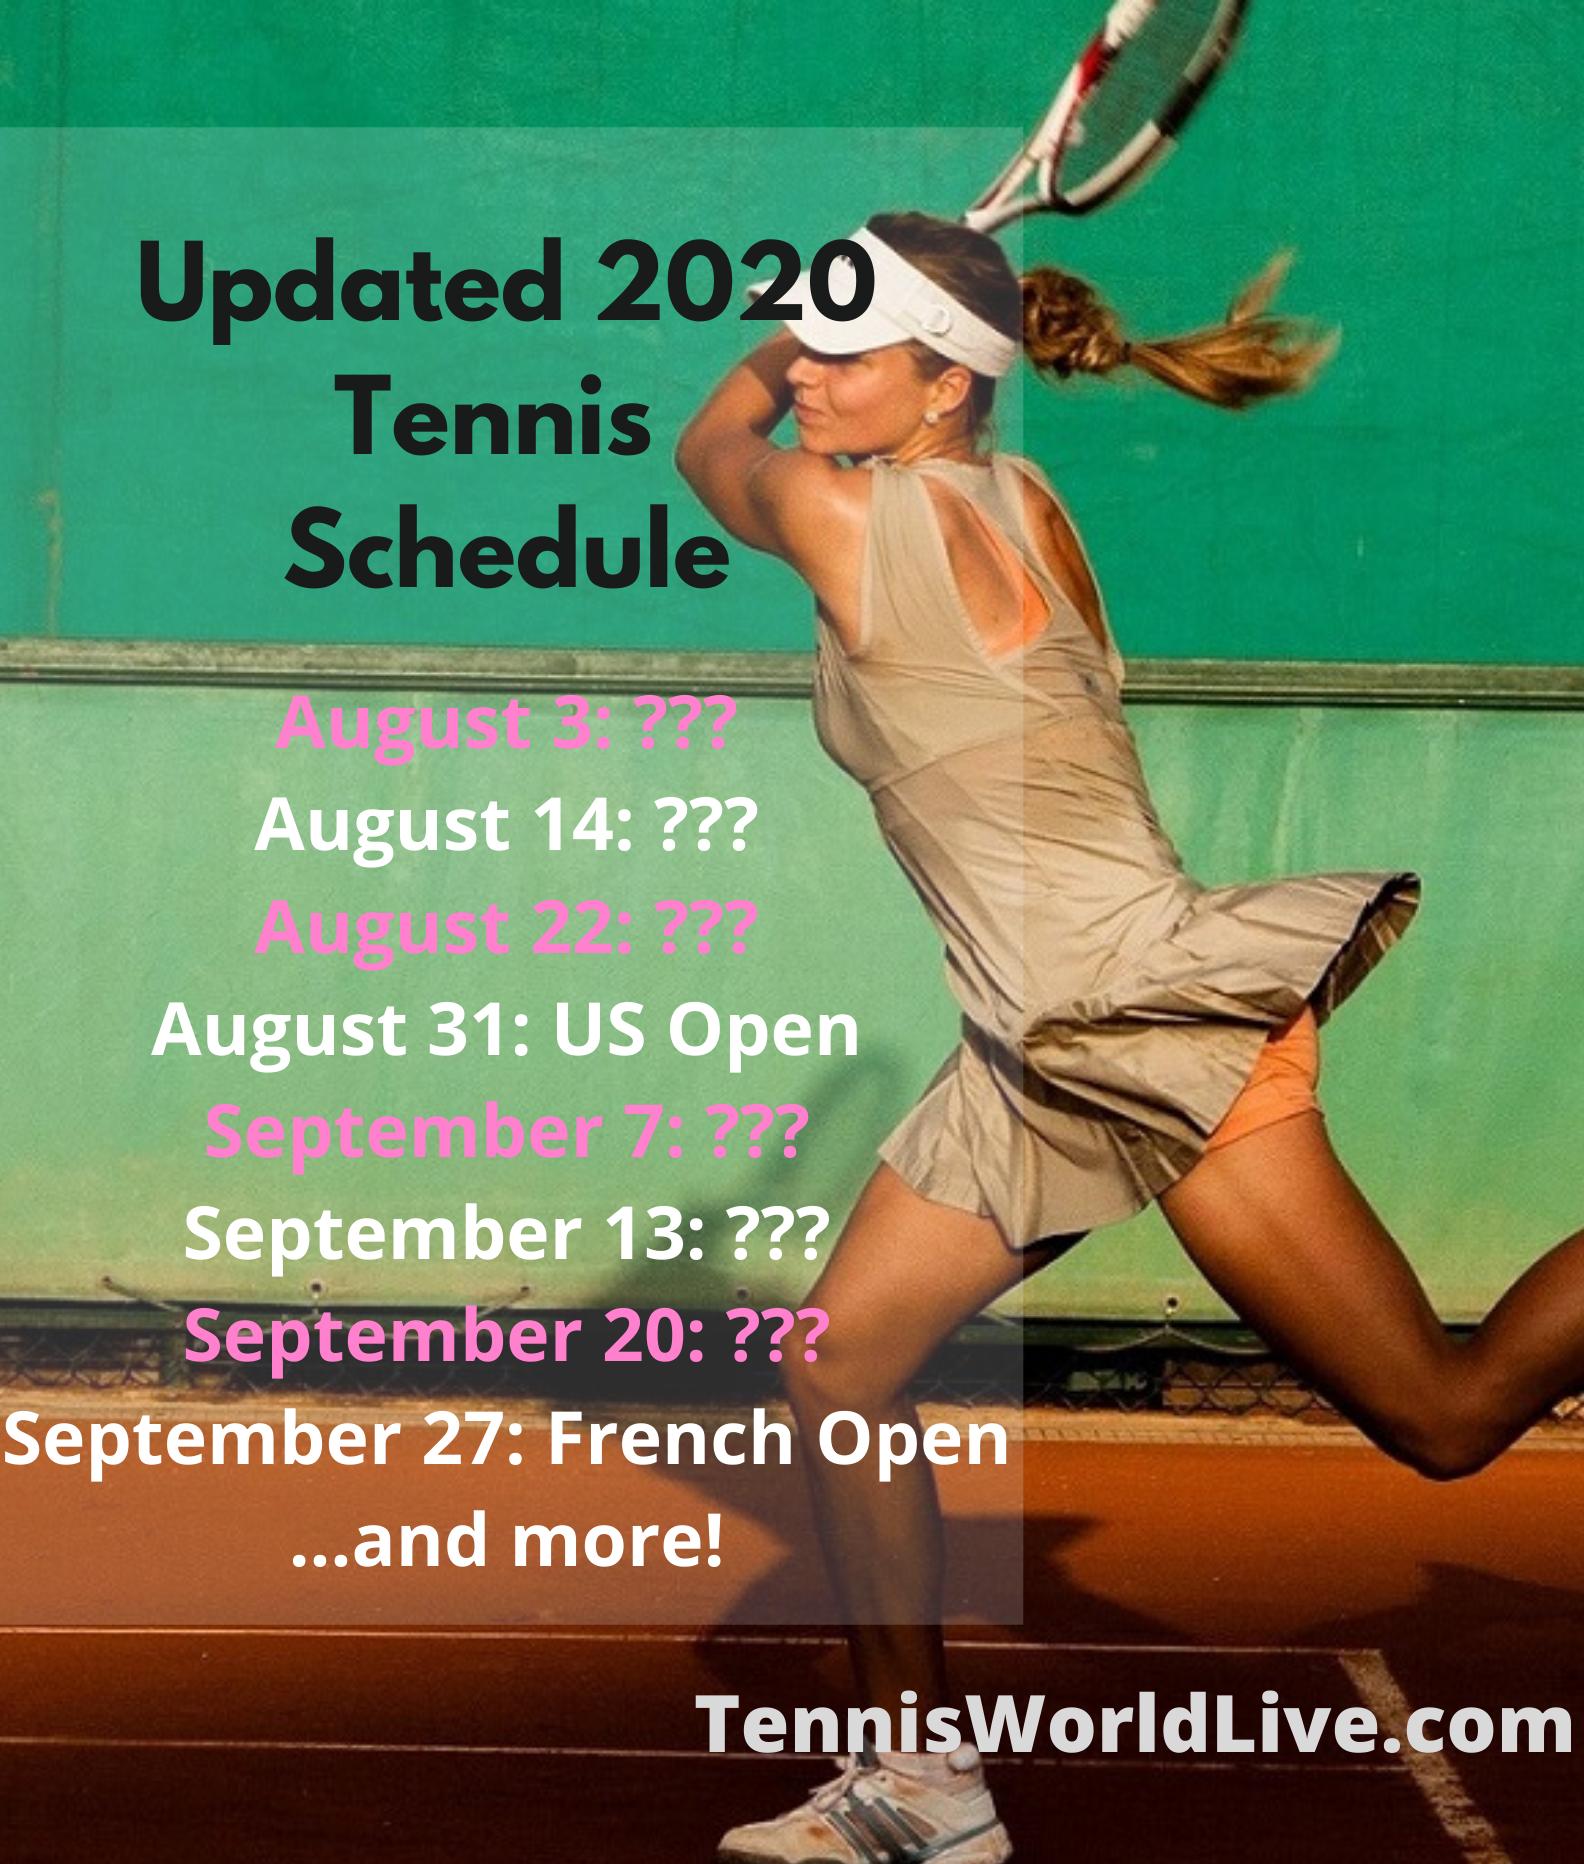 Updated Atp Wta Schedule For 2020 In 2020 Tennis Schedule Tennis Tennis Tournaments